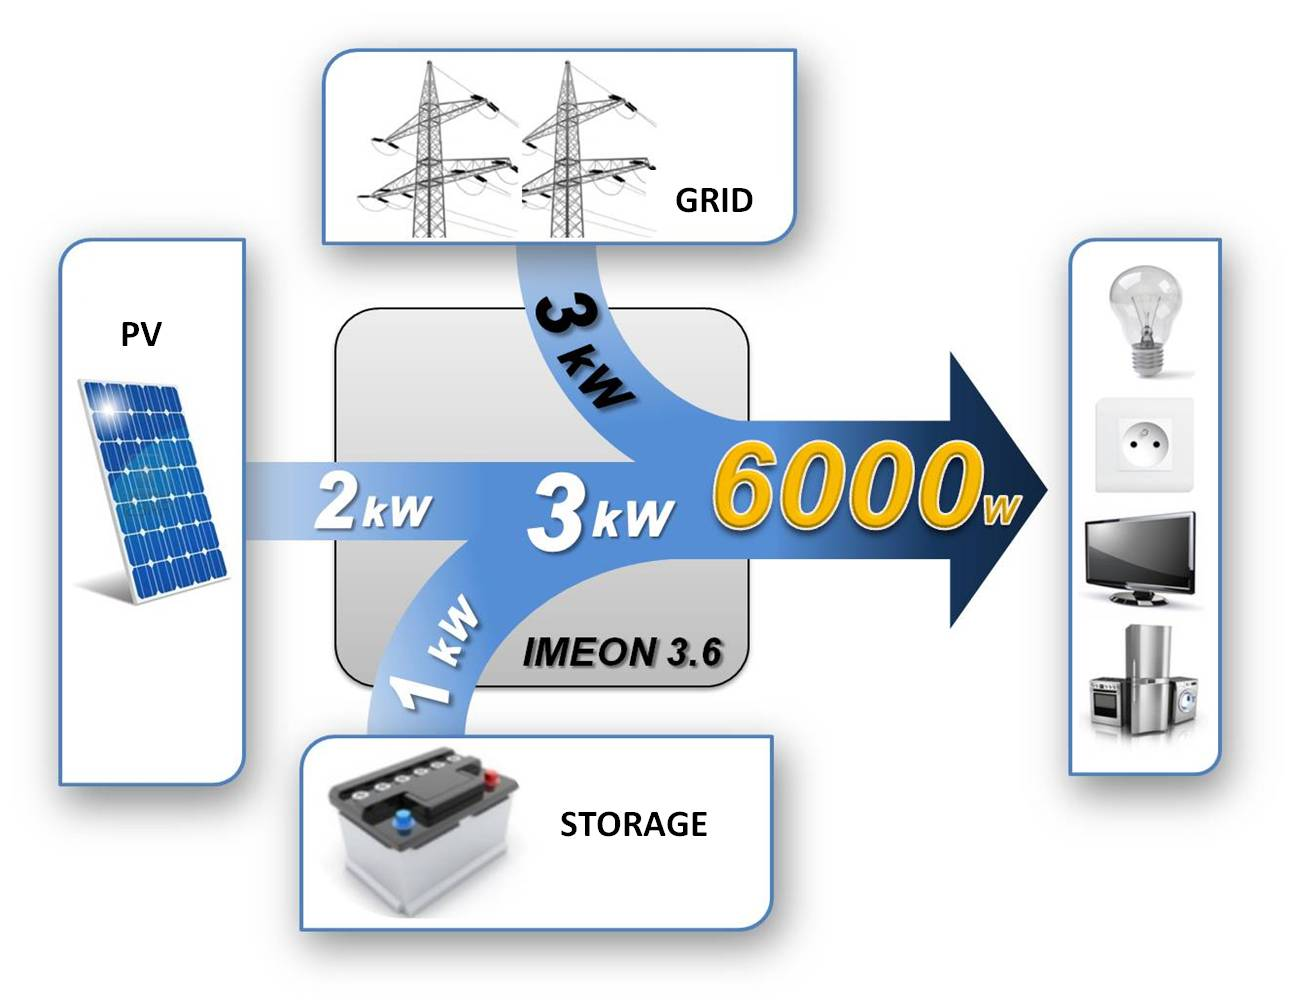 IMEON ENERGY Couplage Multiphase onduleur smart grid intelligent autoconsommation solar self use